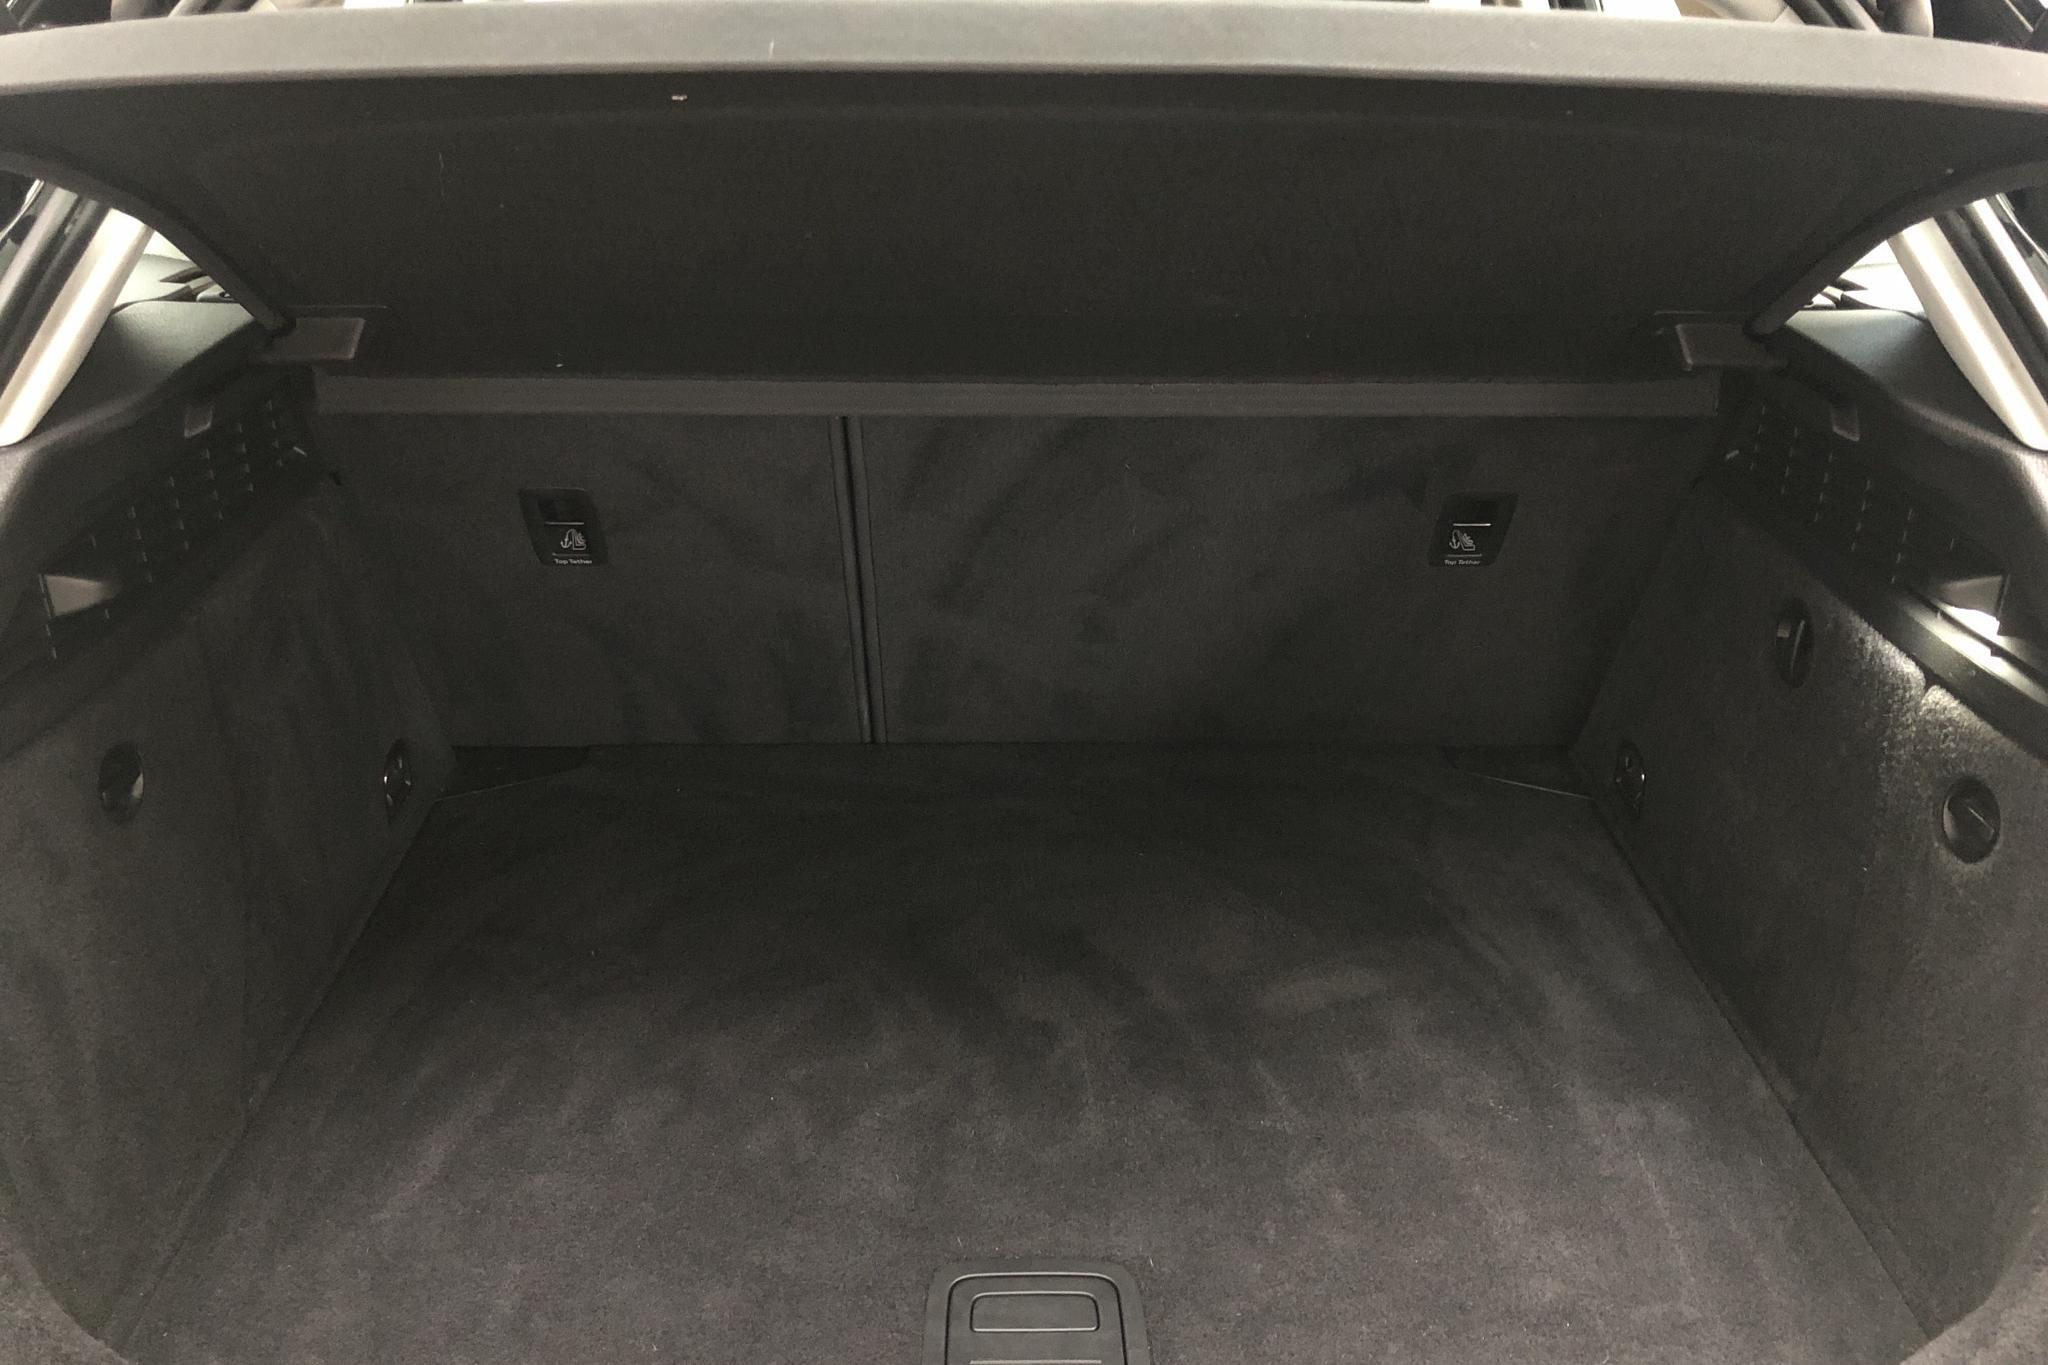 Audi A3 1.6 TDI Sportback (105hk) - 149 830 km - Automatic - black - 2014